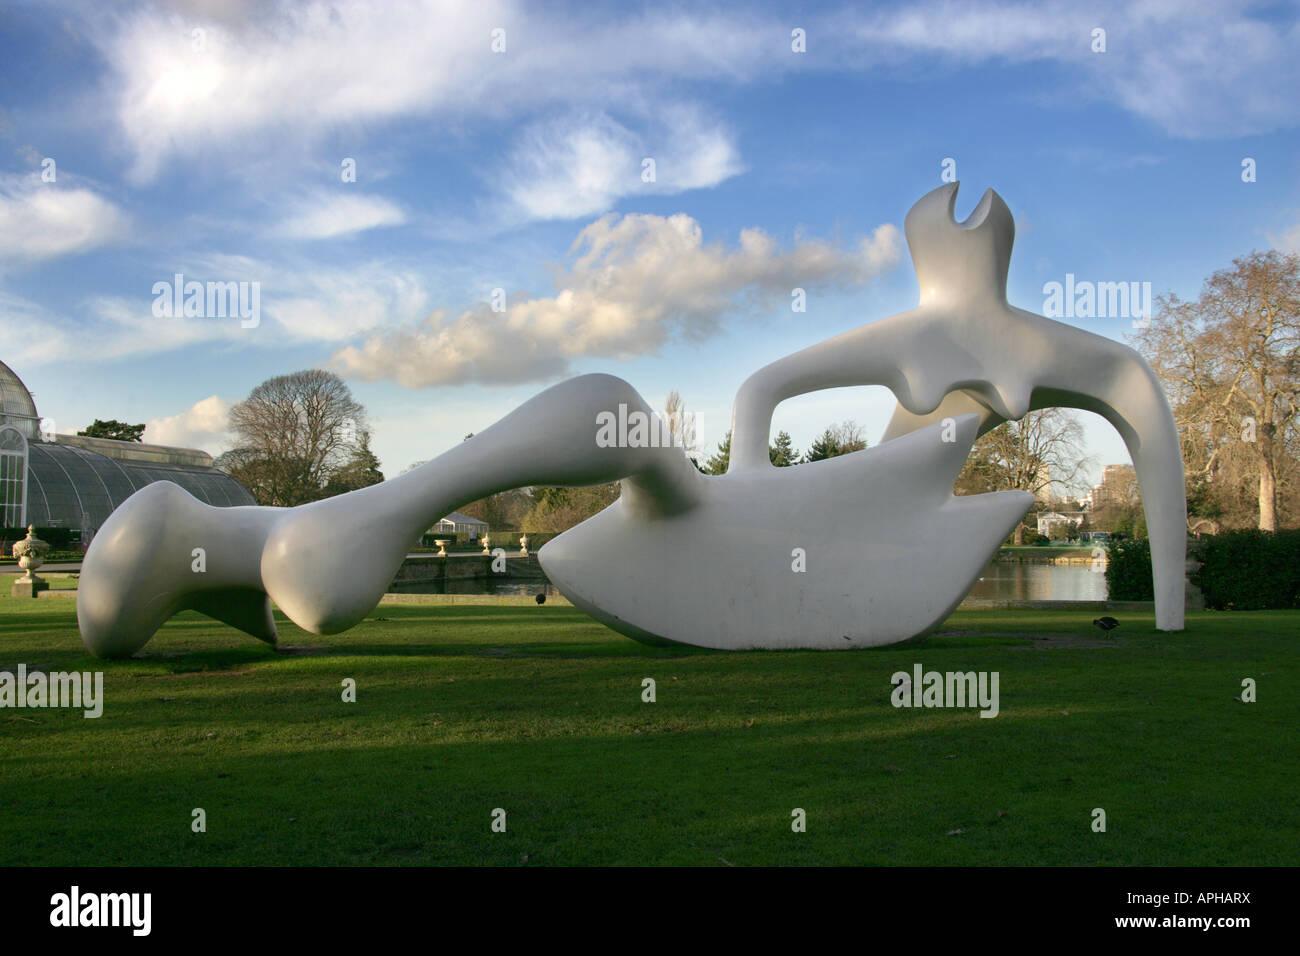 Large Reclining Figure Henry Moore Sculpture Kew Gardens 2007 Stock ...